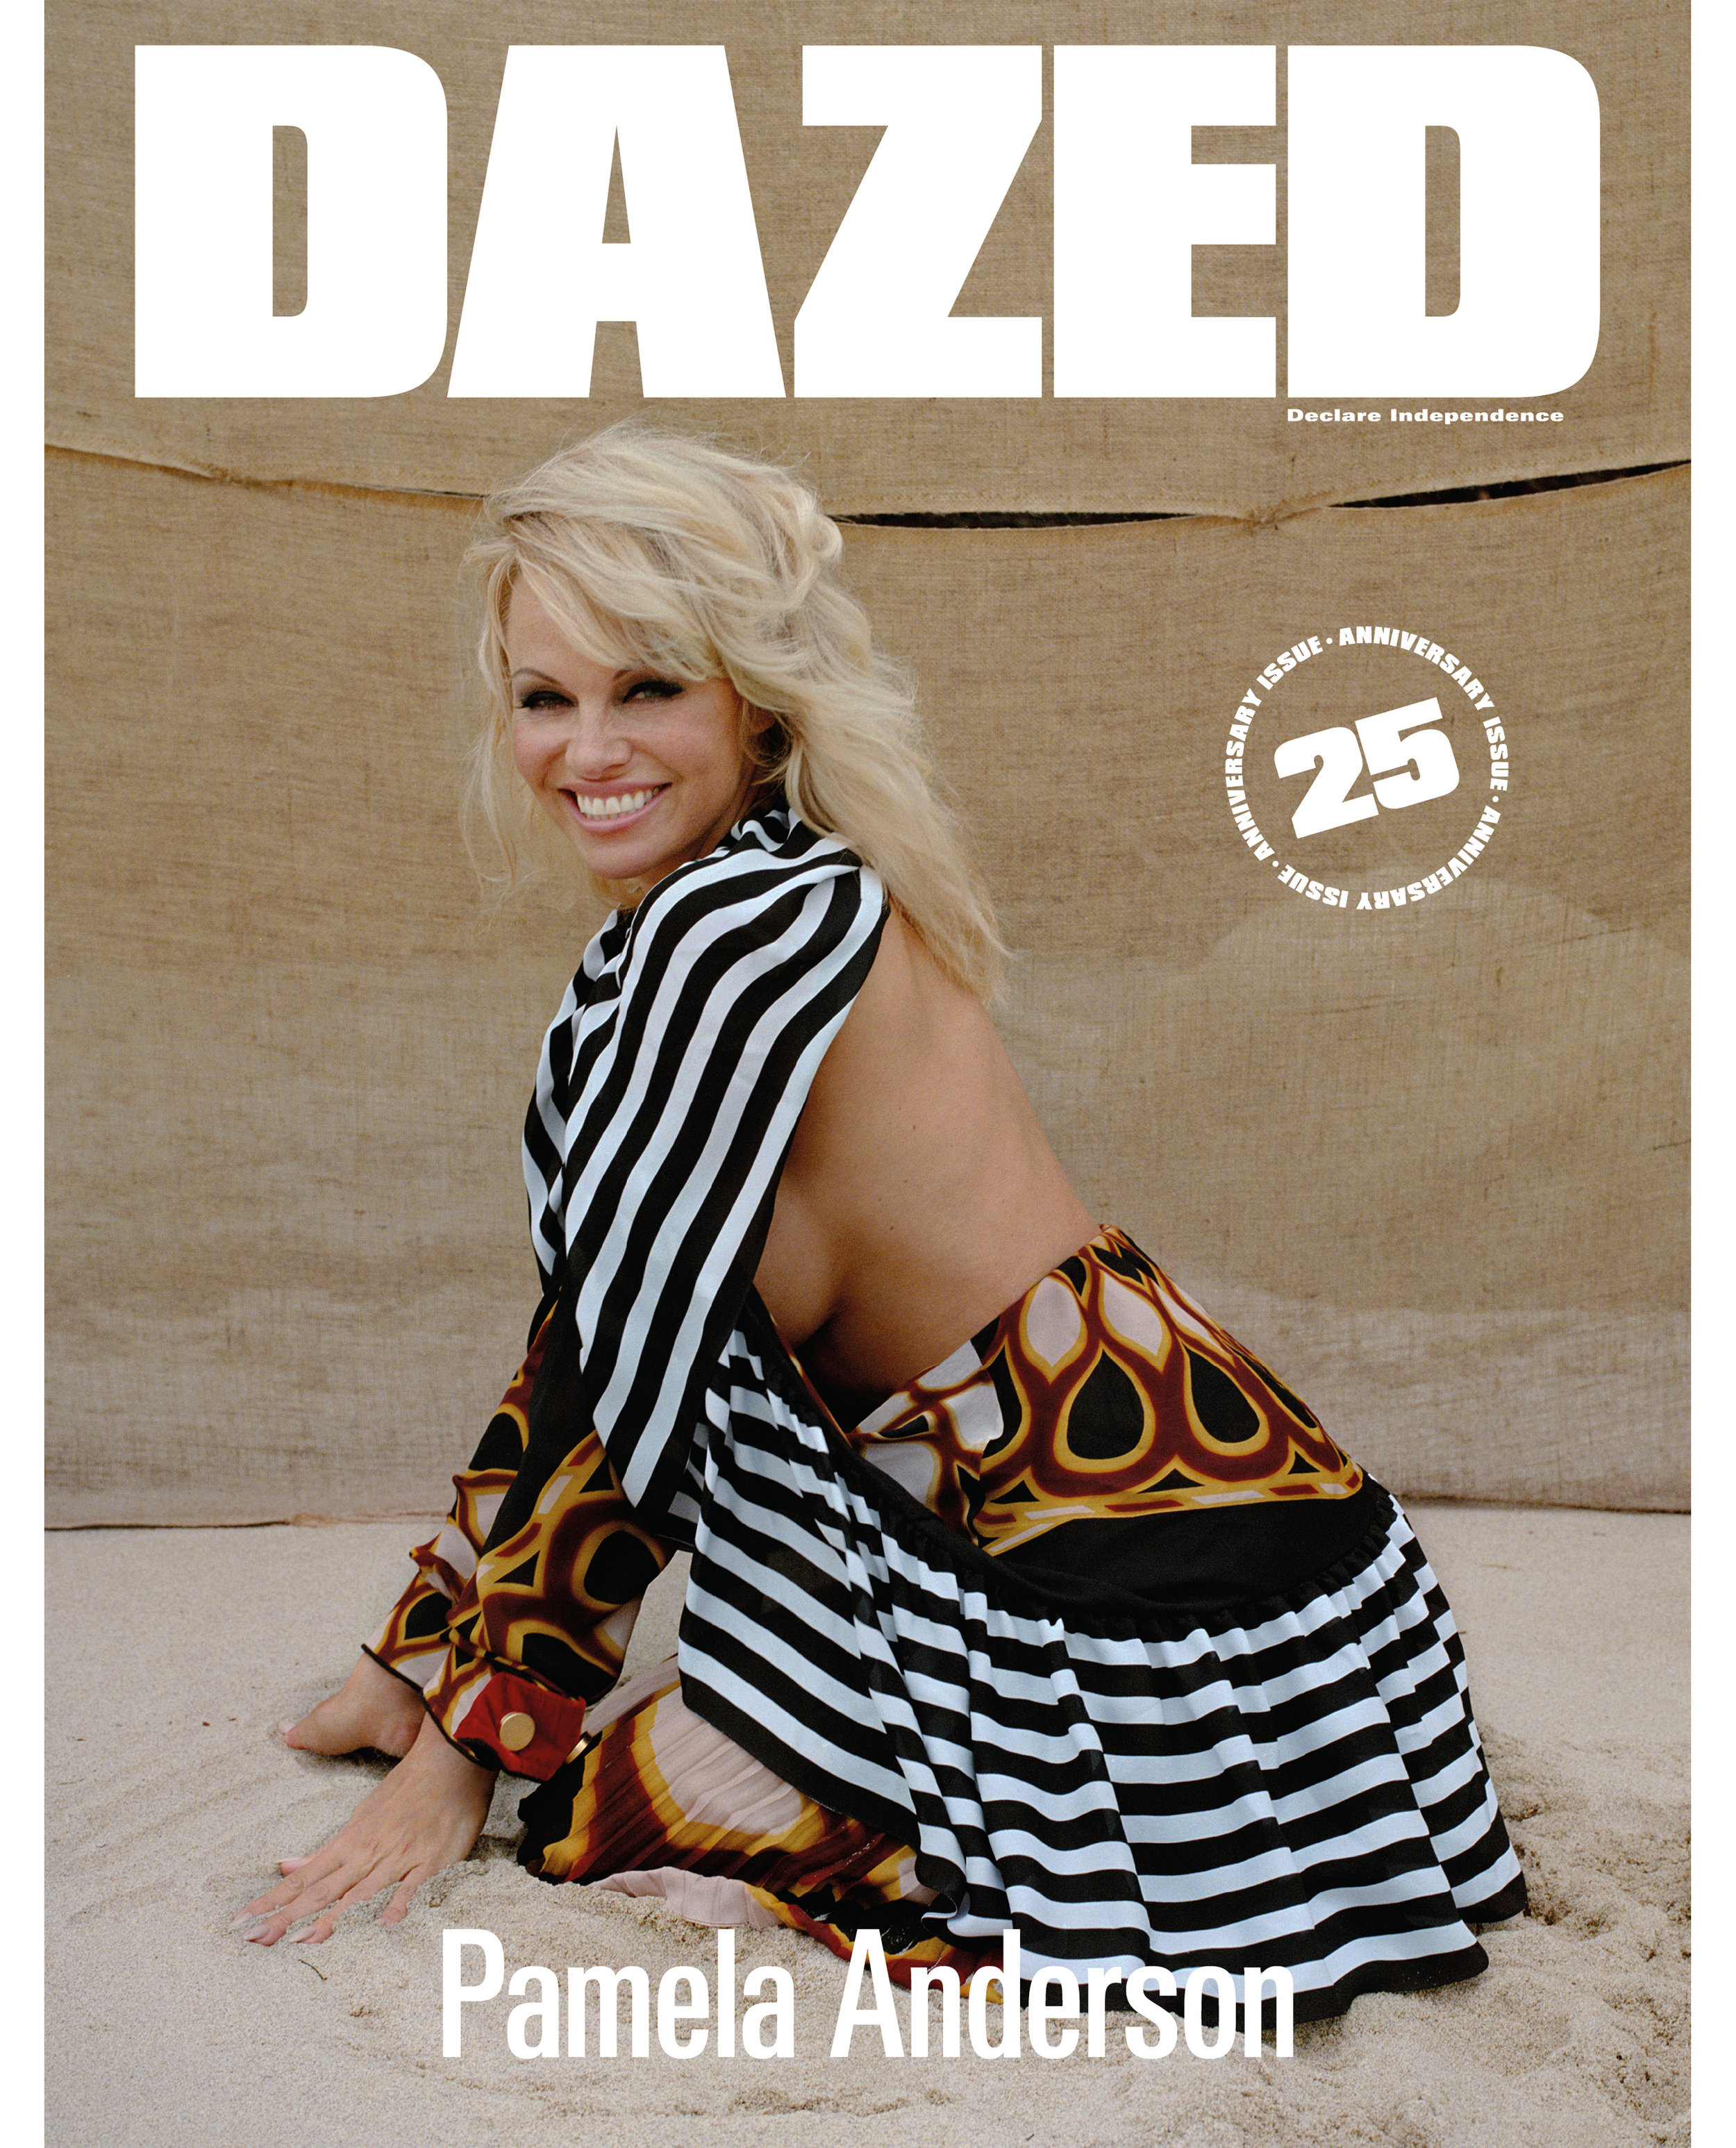 Photography Zoe Ghertner -Fashion Emma Wyman -Interview Isabella Burley